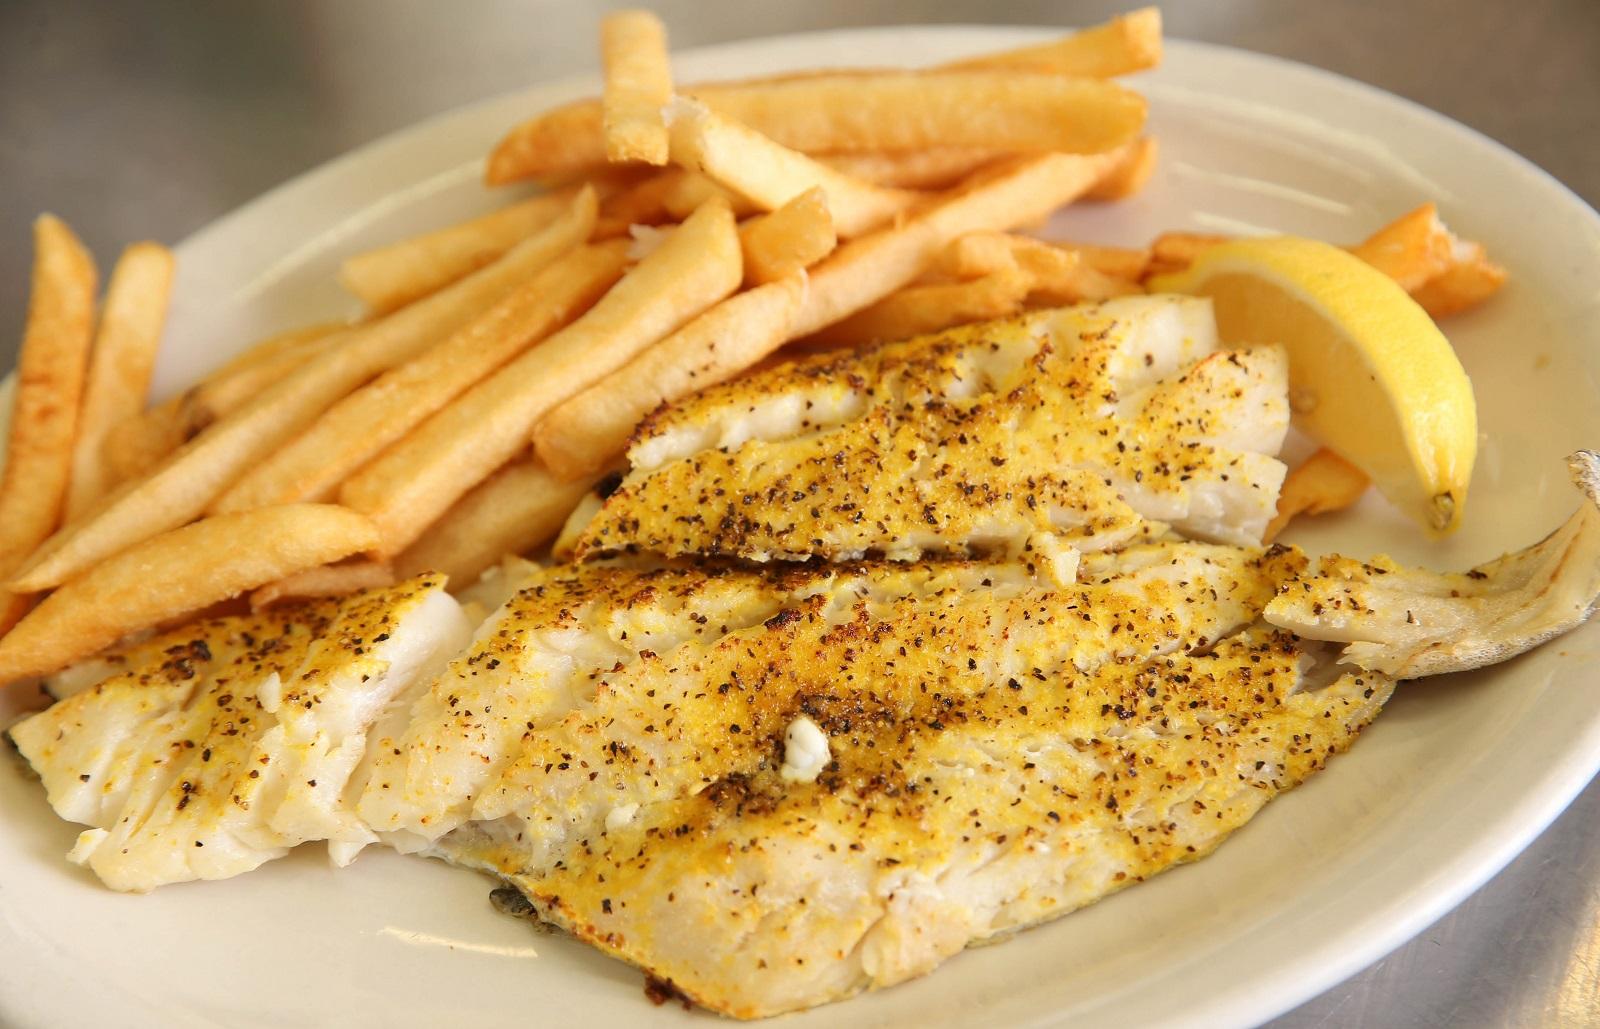 This is the lemon pepper broiled fish dinner. Potato and macaroni salads are available at the salad bar. (Sharon Cantillon/Buffalo News)